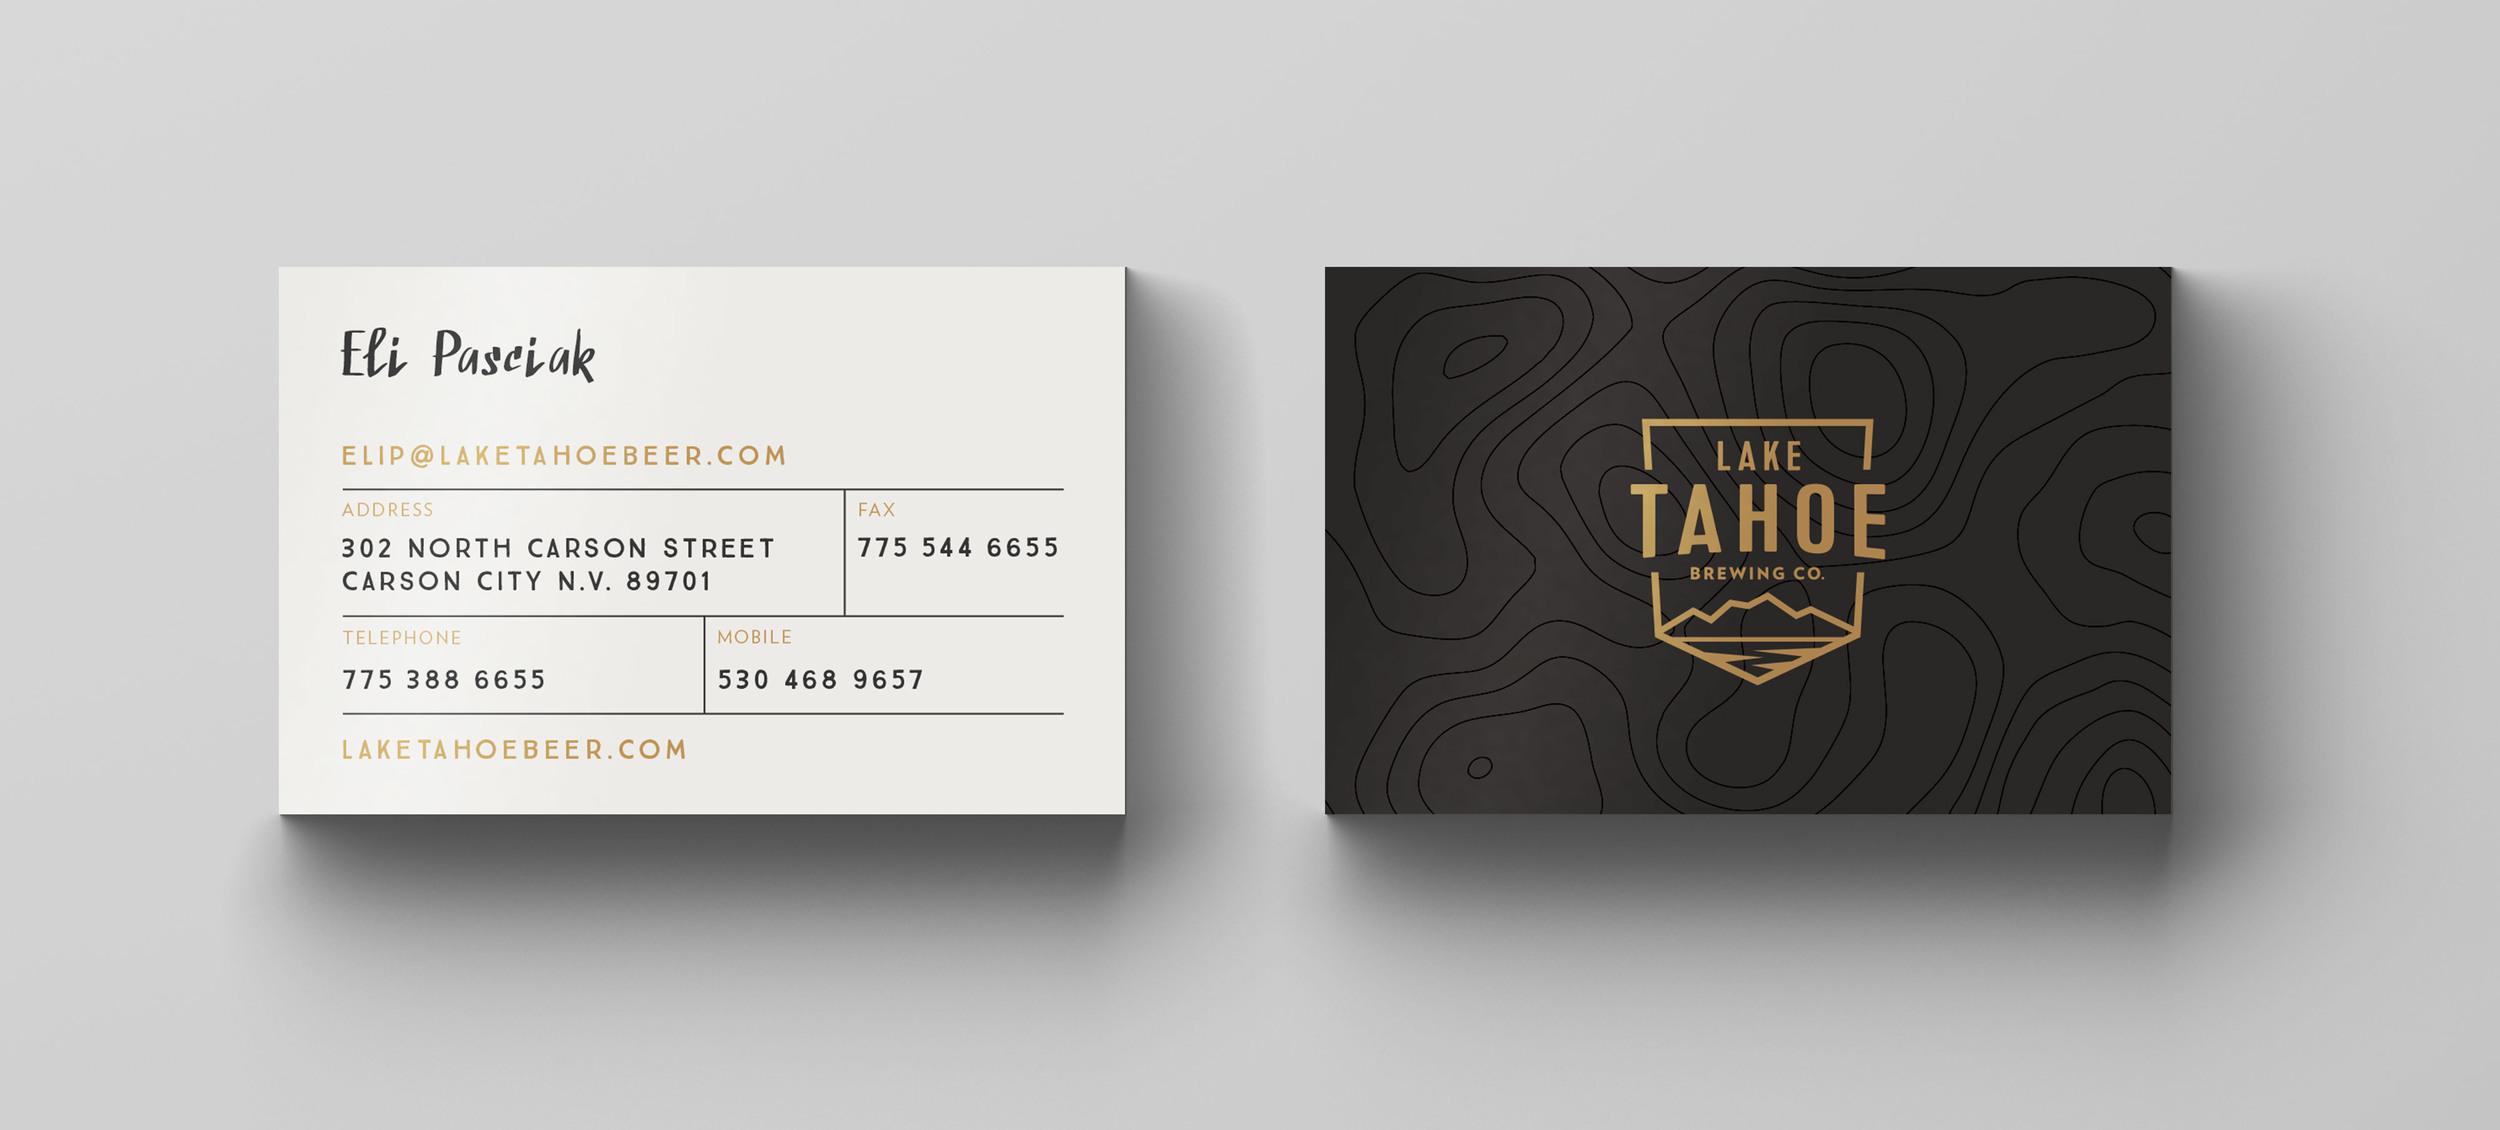 business+card+mockup_1.jpg